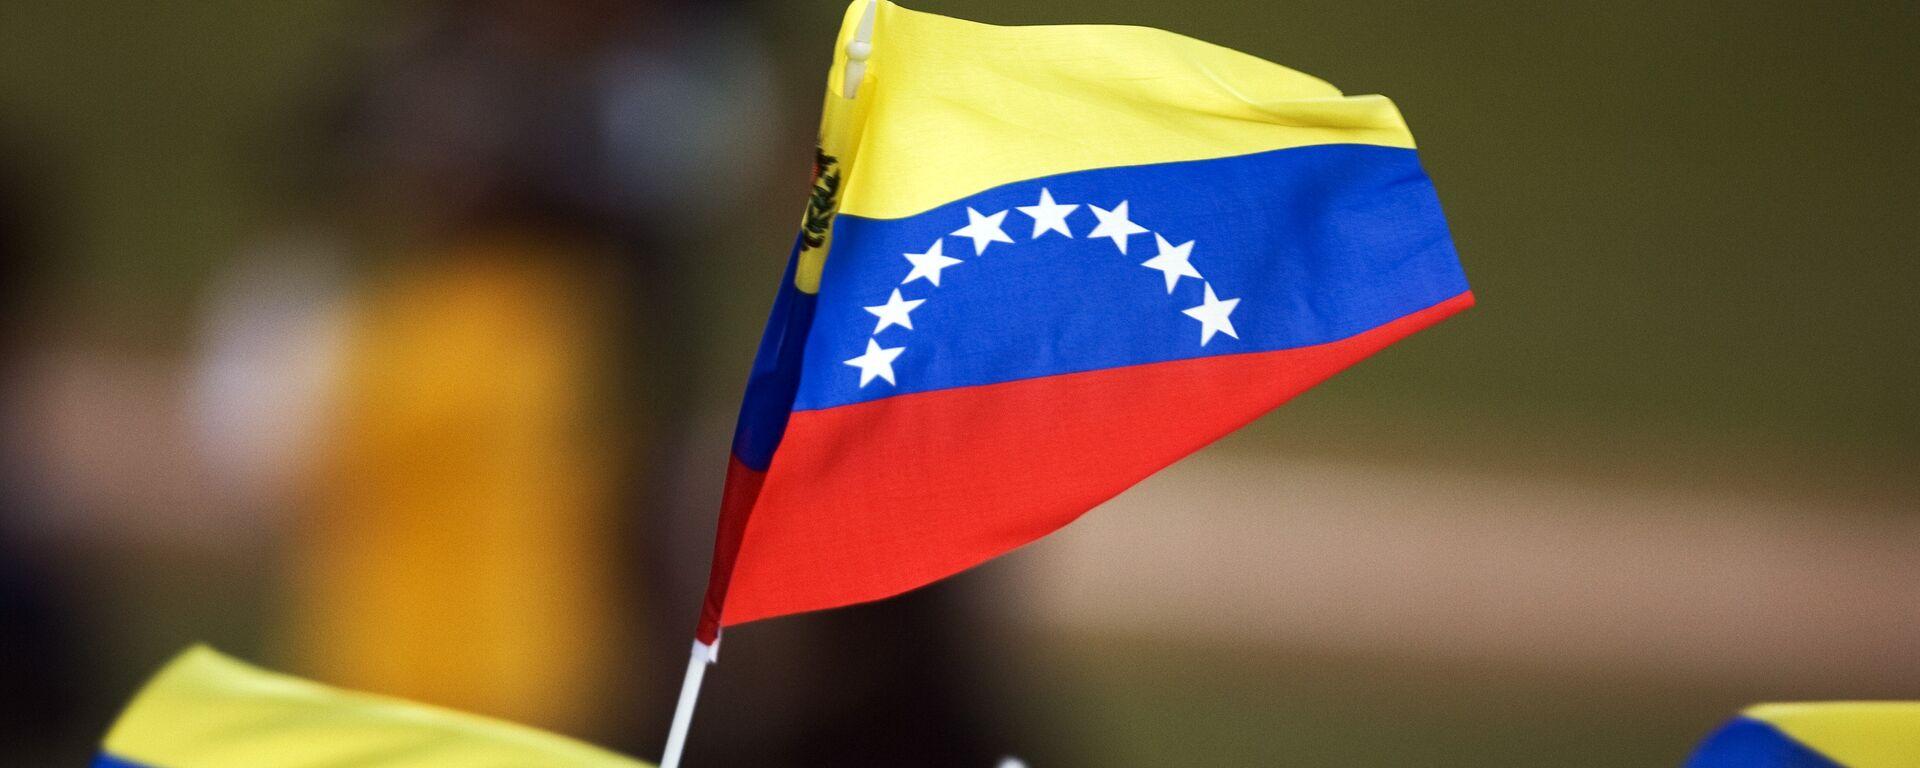 Banderas de Venezuela - Sputnik Mundo, 1920, 30.06.2021